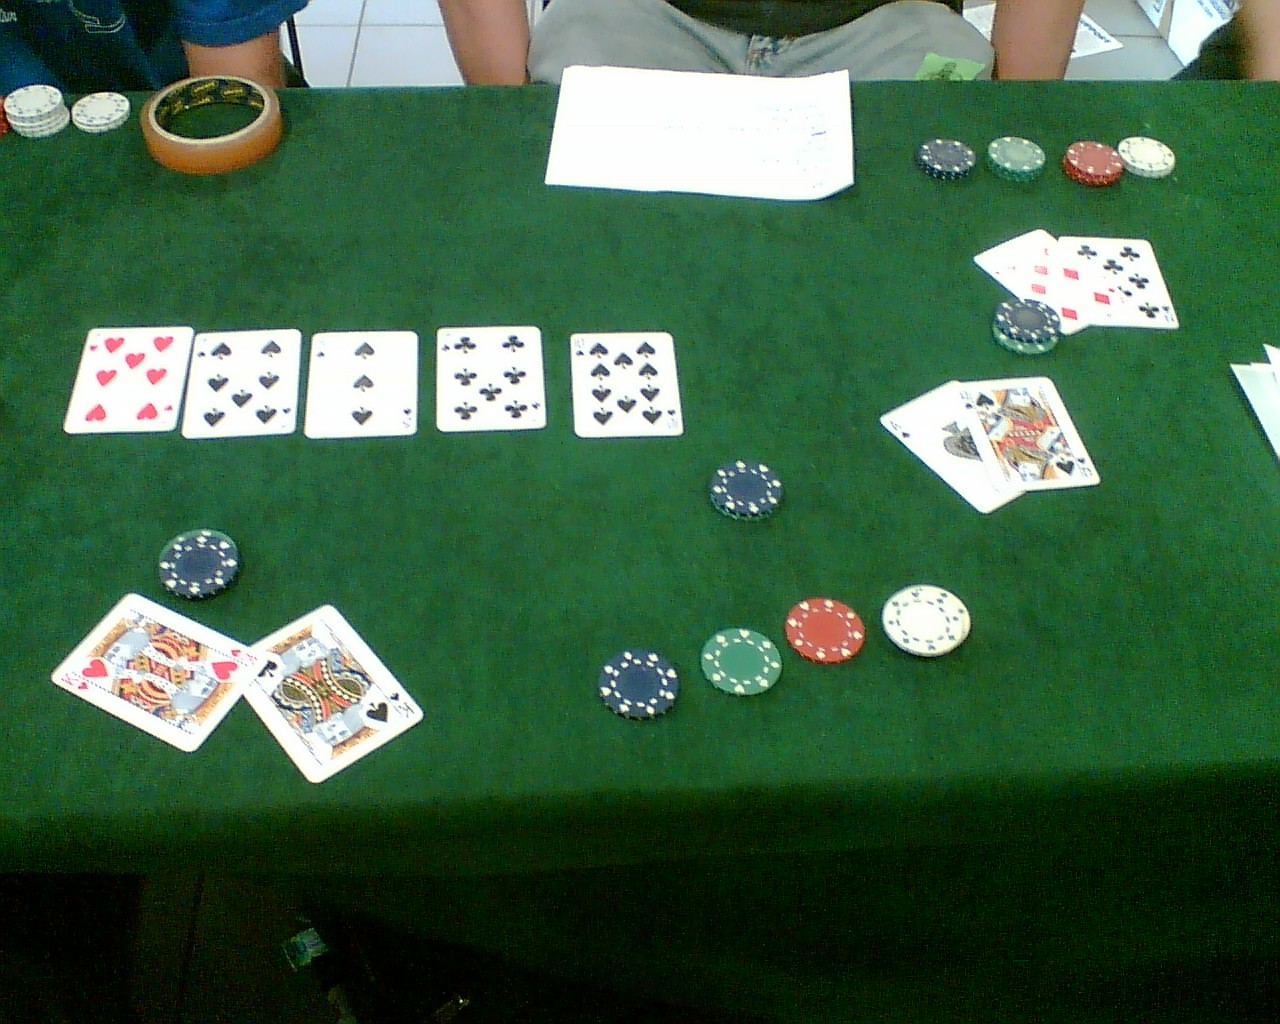 Poker run kingston ontario 2014